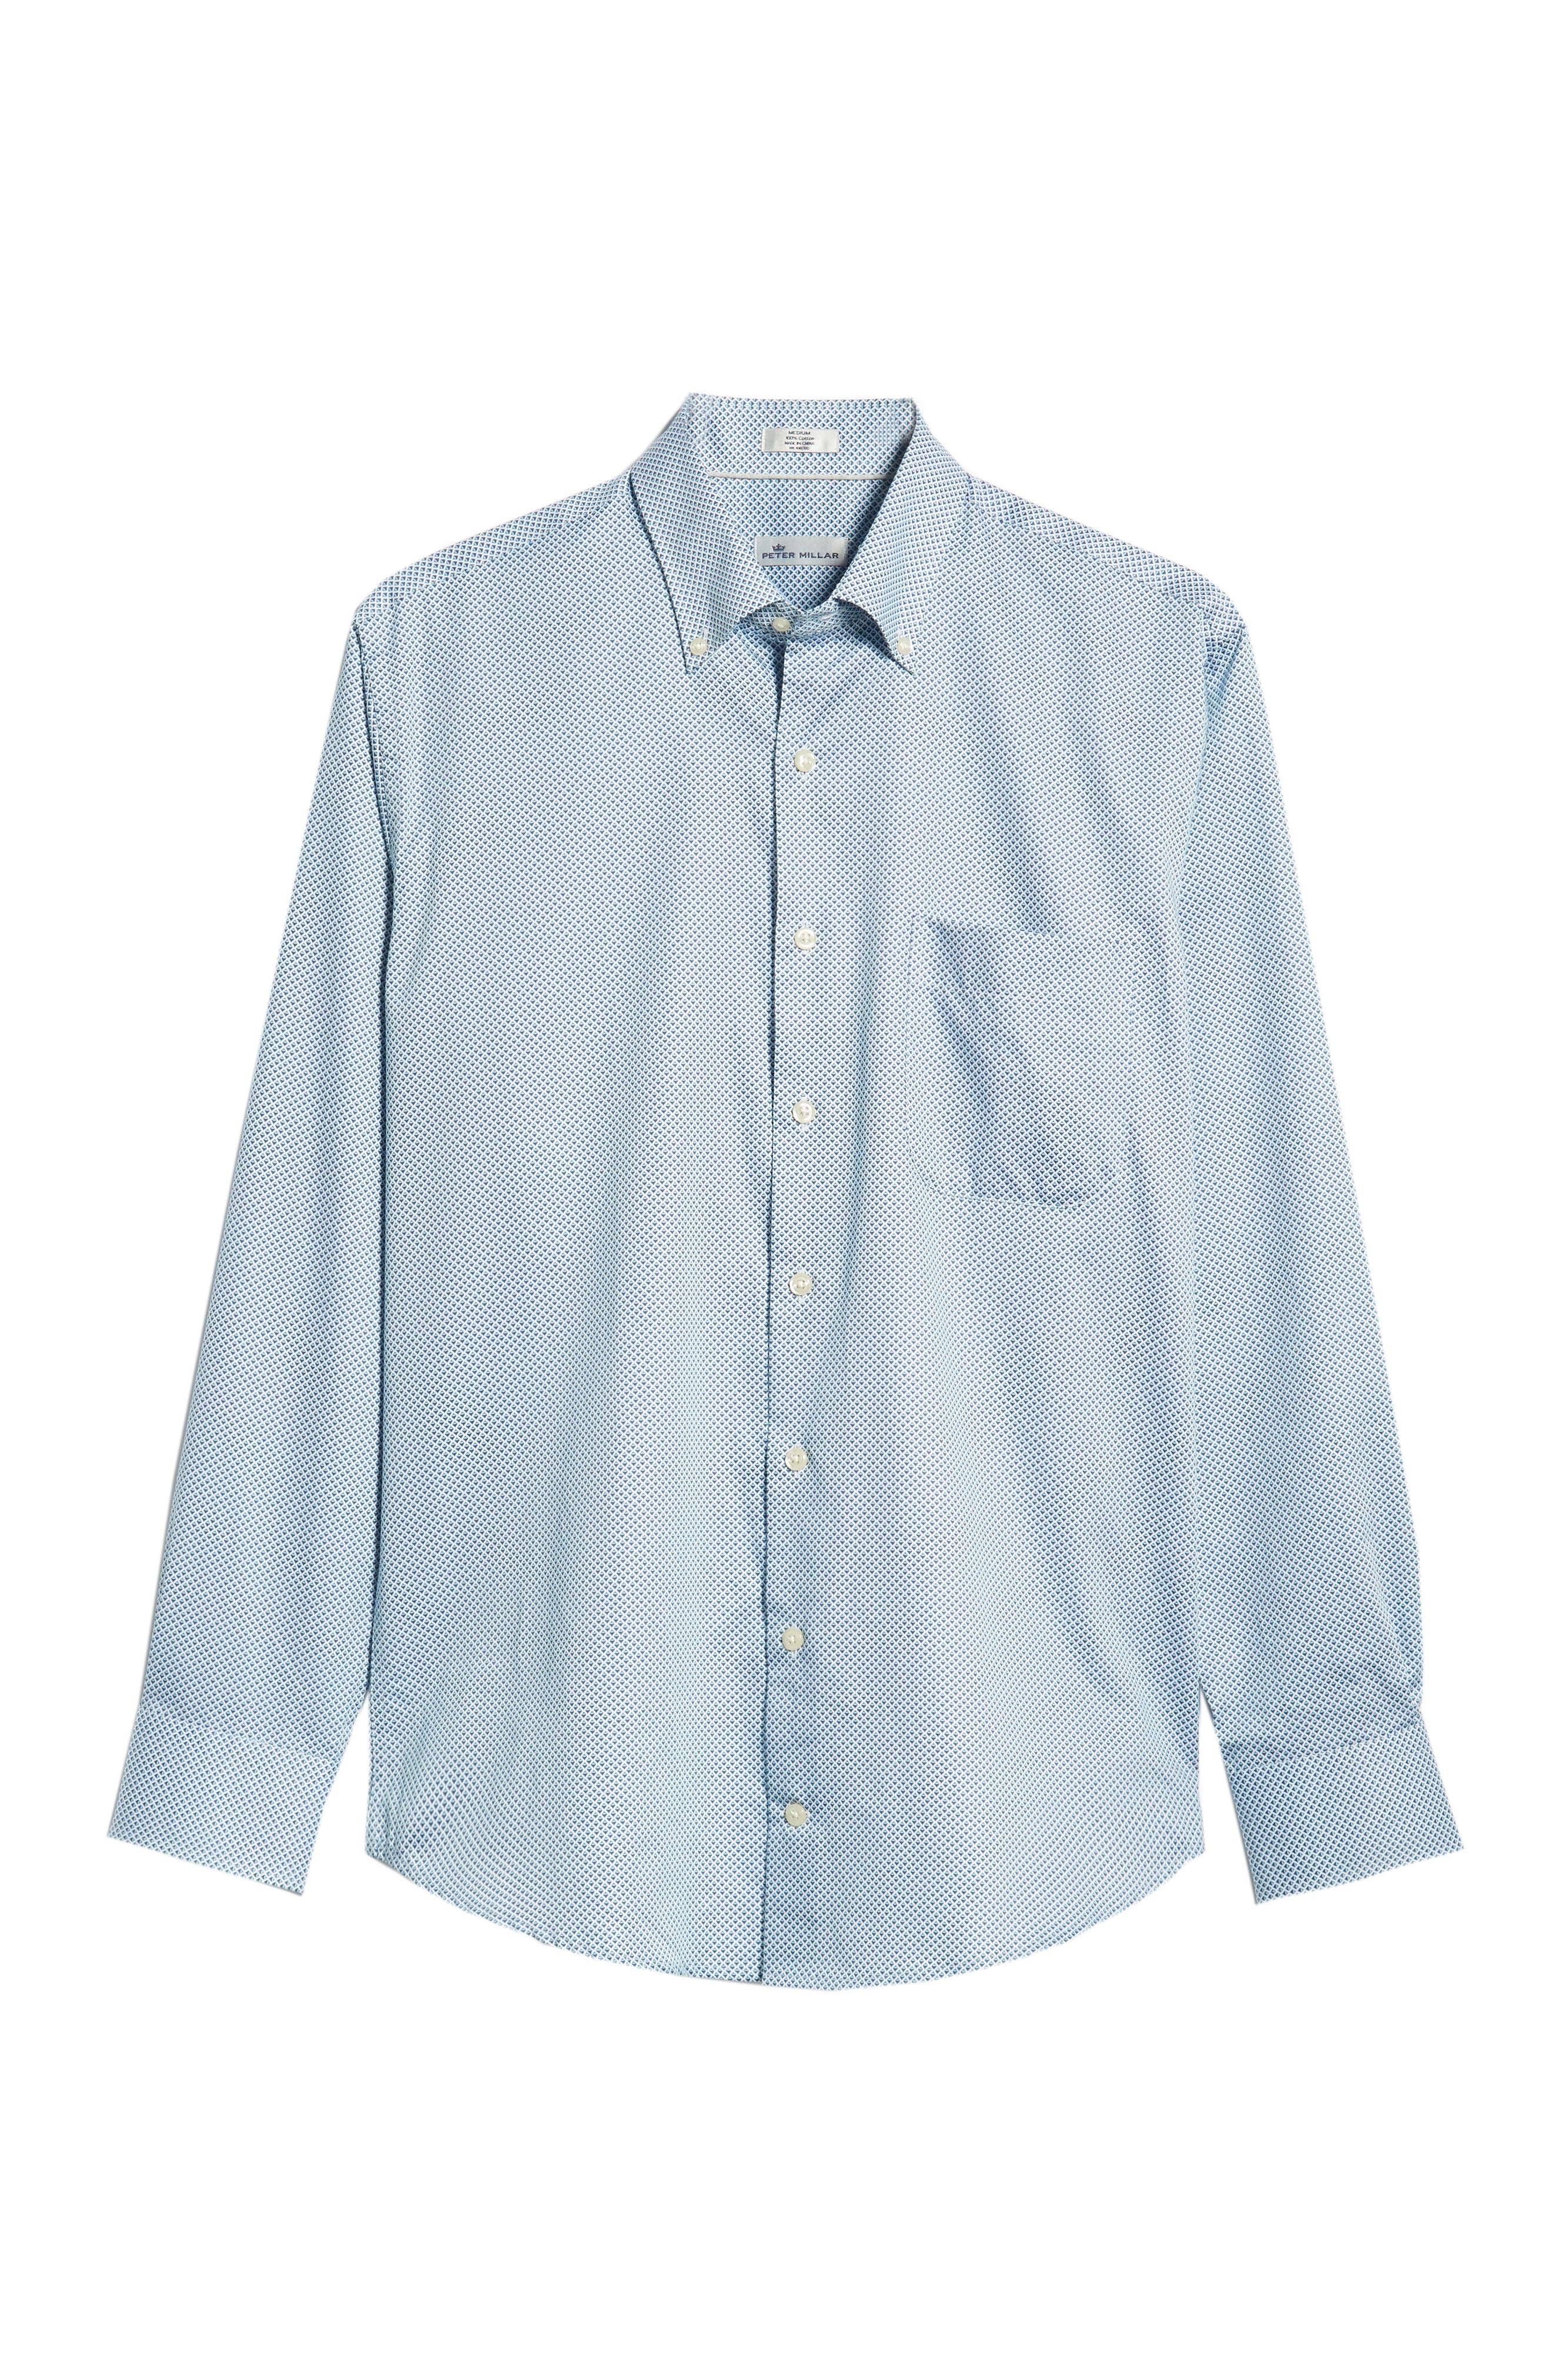 Diamond in the Rough Regular Fit Sport Shirt,                             Alternate thumbnail 5, color,                             NAVY